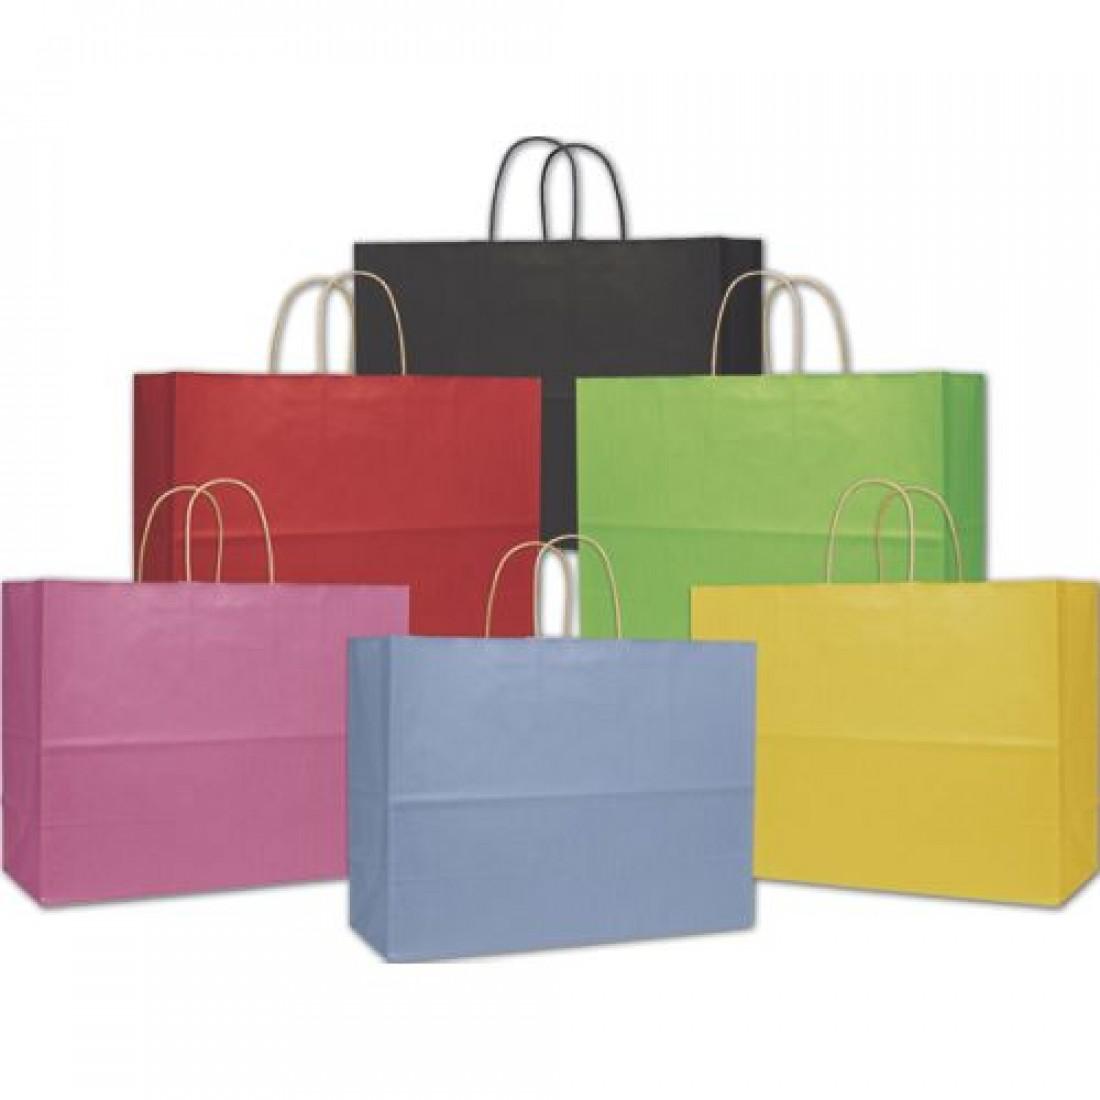 Varnsh Stripe Bag, 16x6x12.5